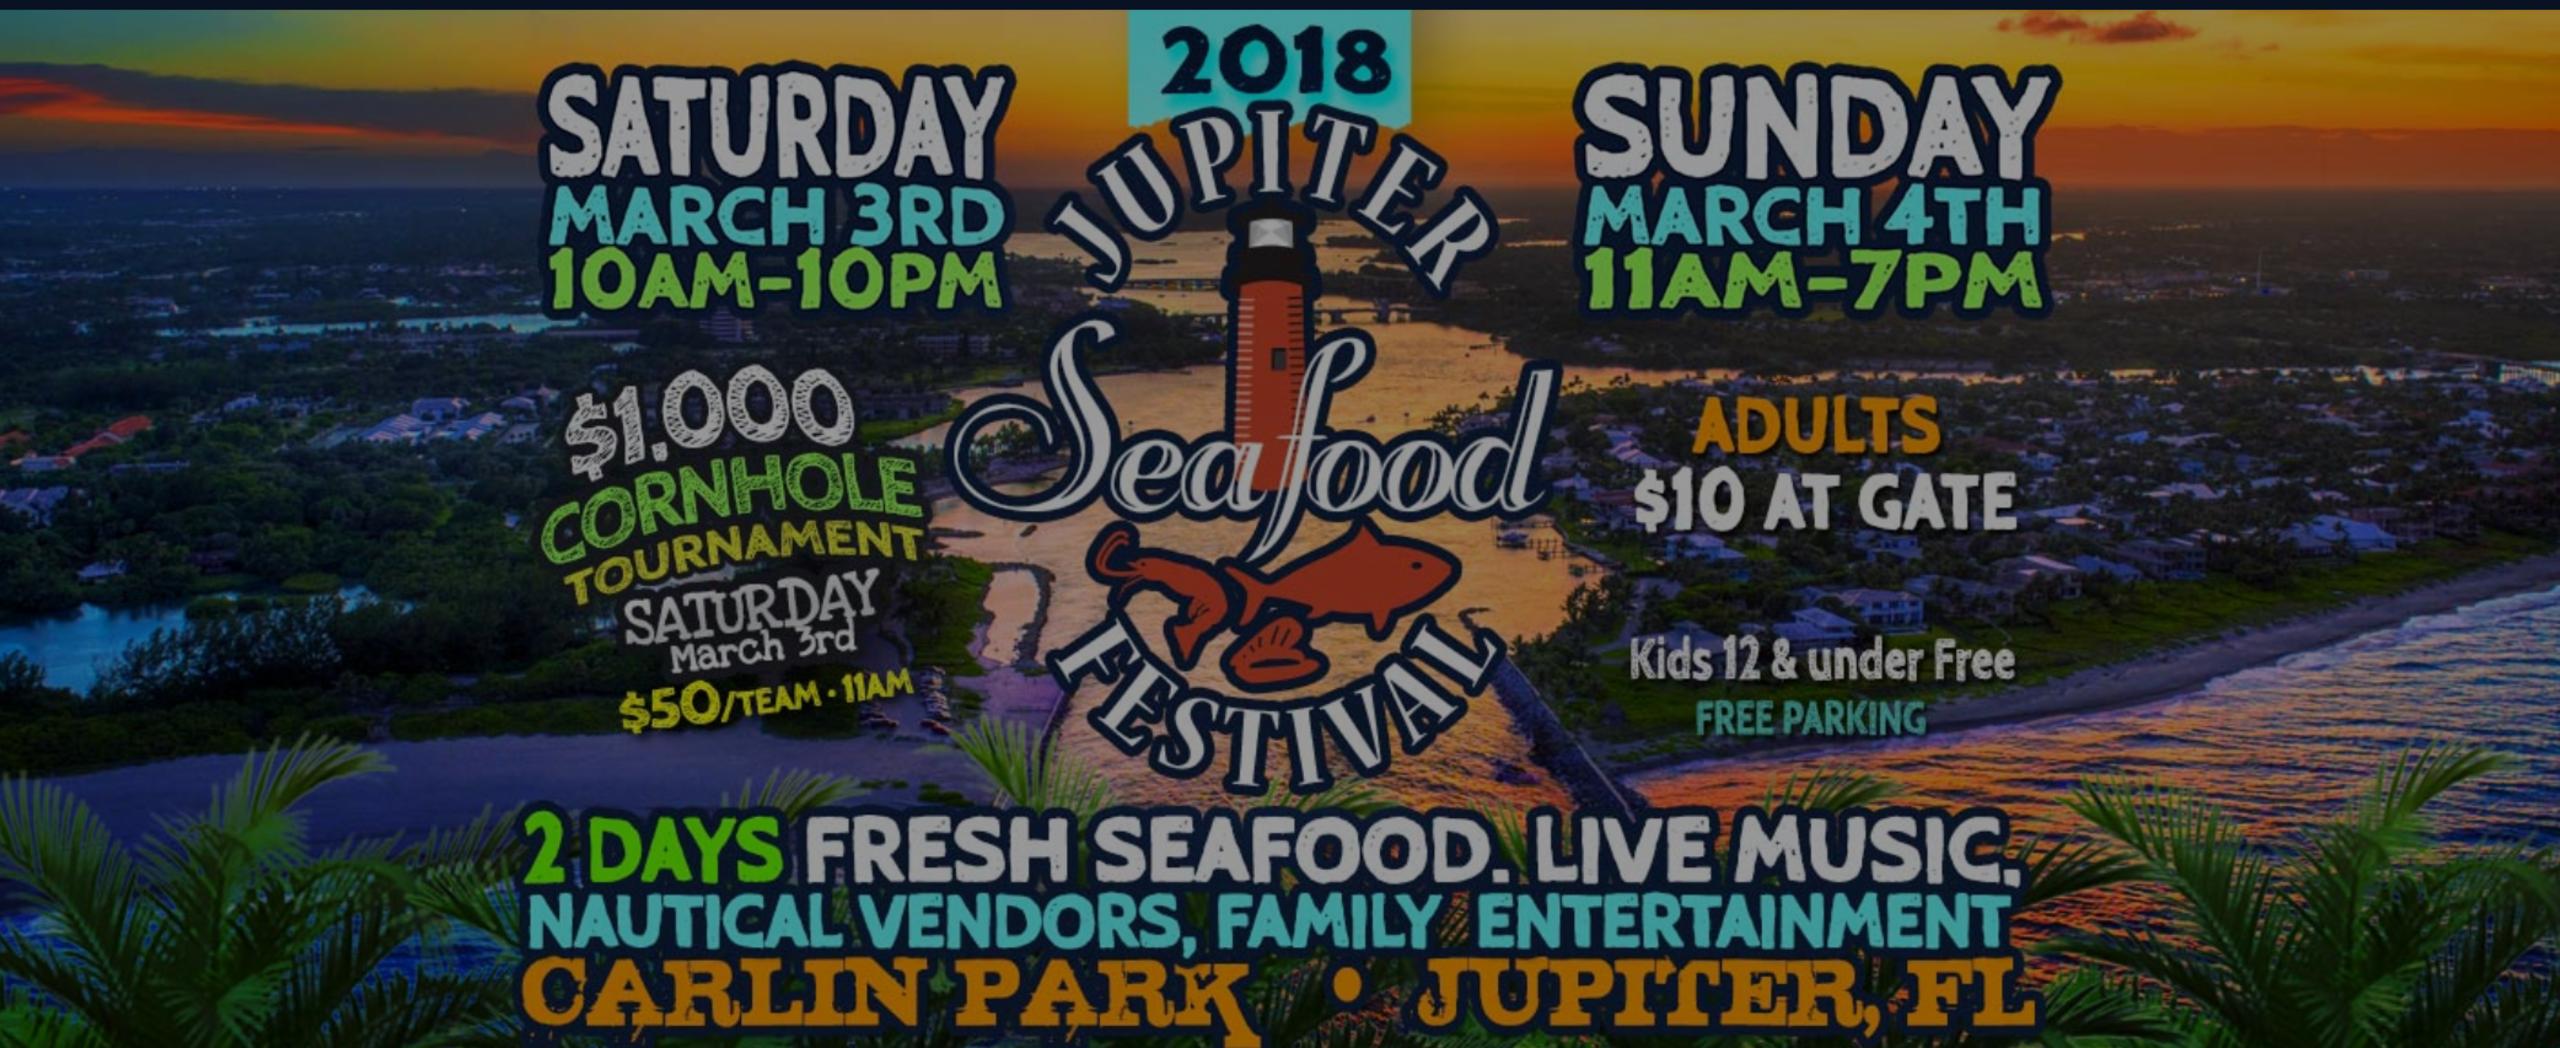 Seafood Festival at Carlin Park in Jupiter!